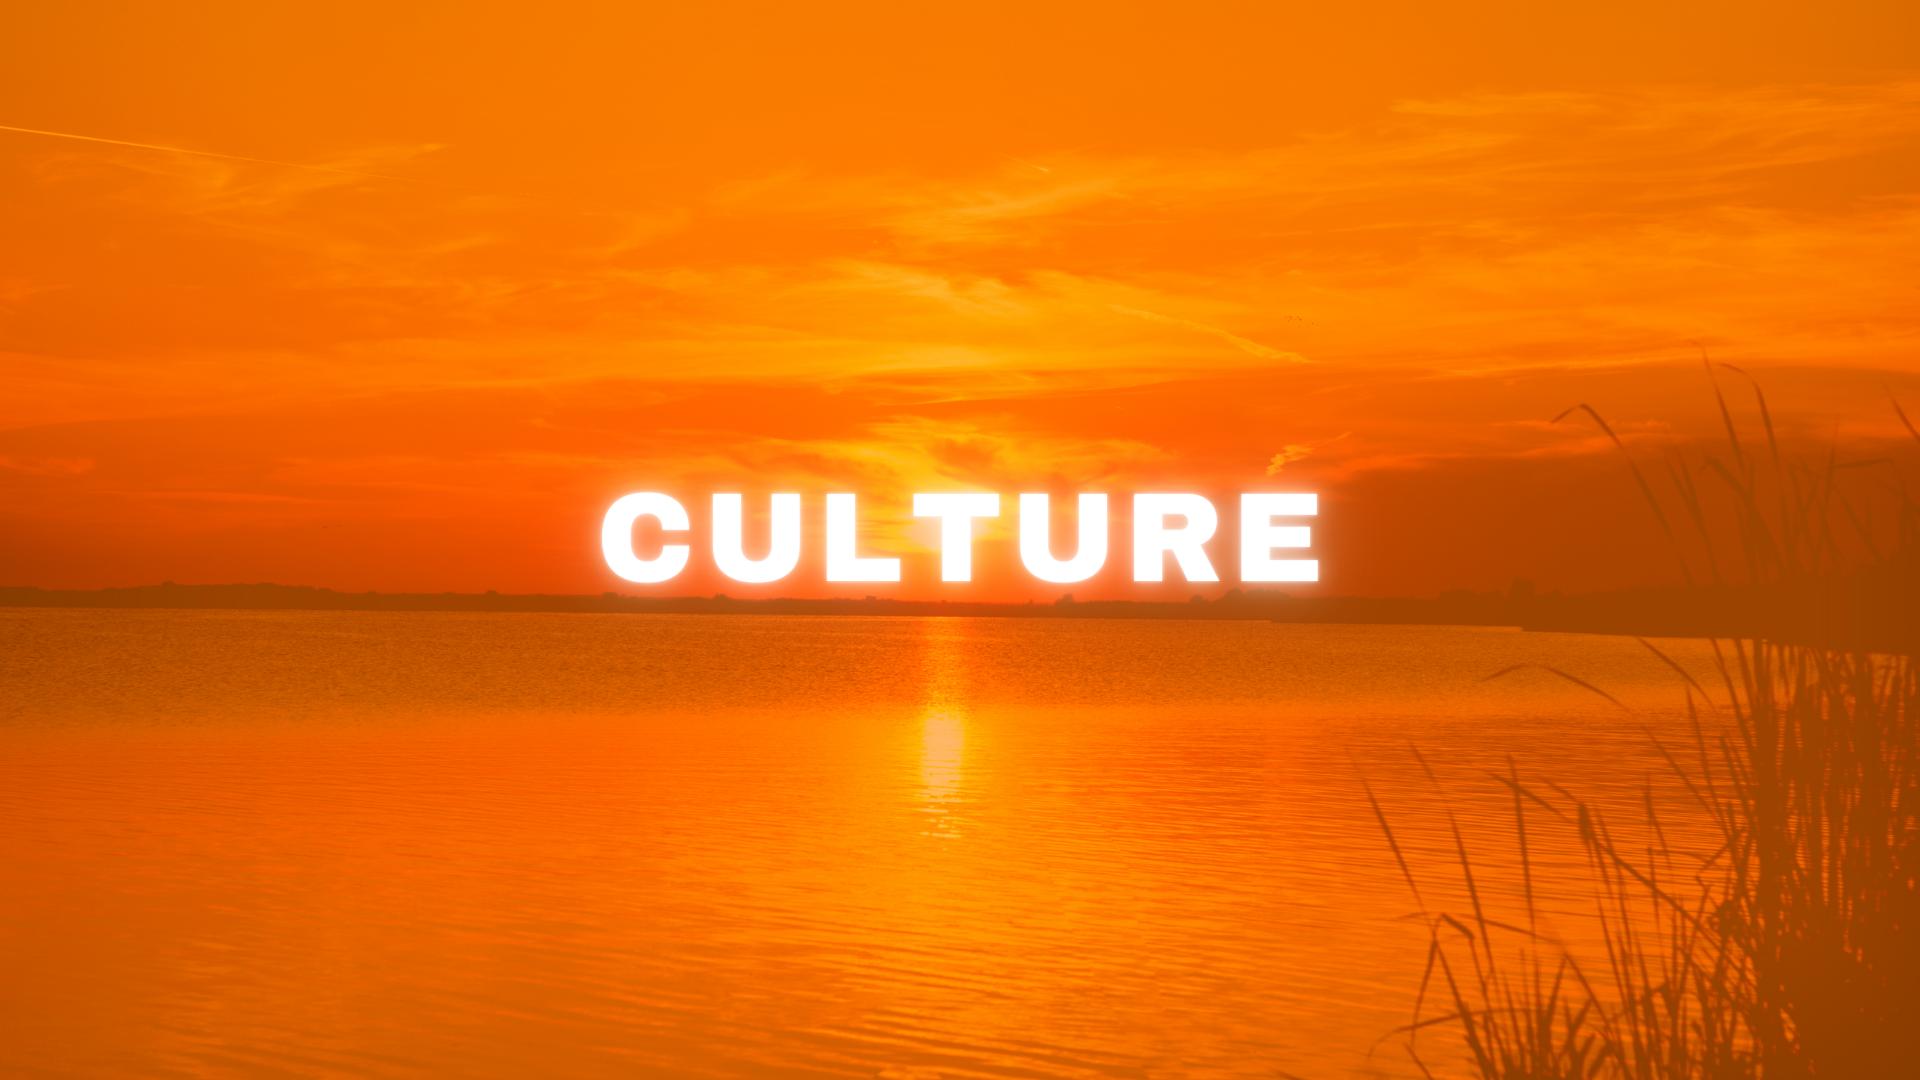 MG8 Cleveland- Culture